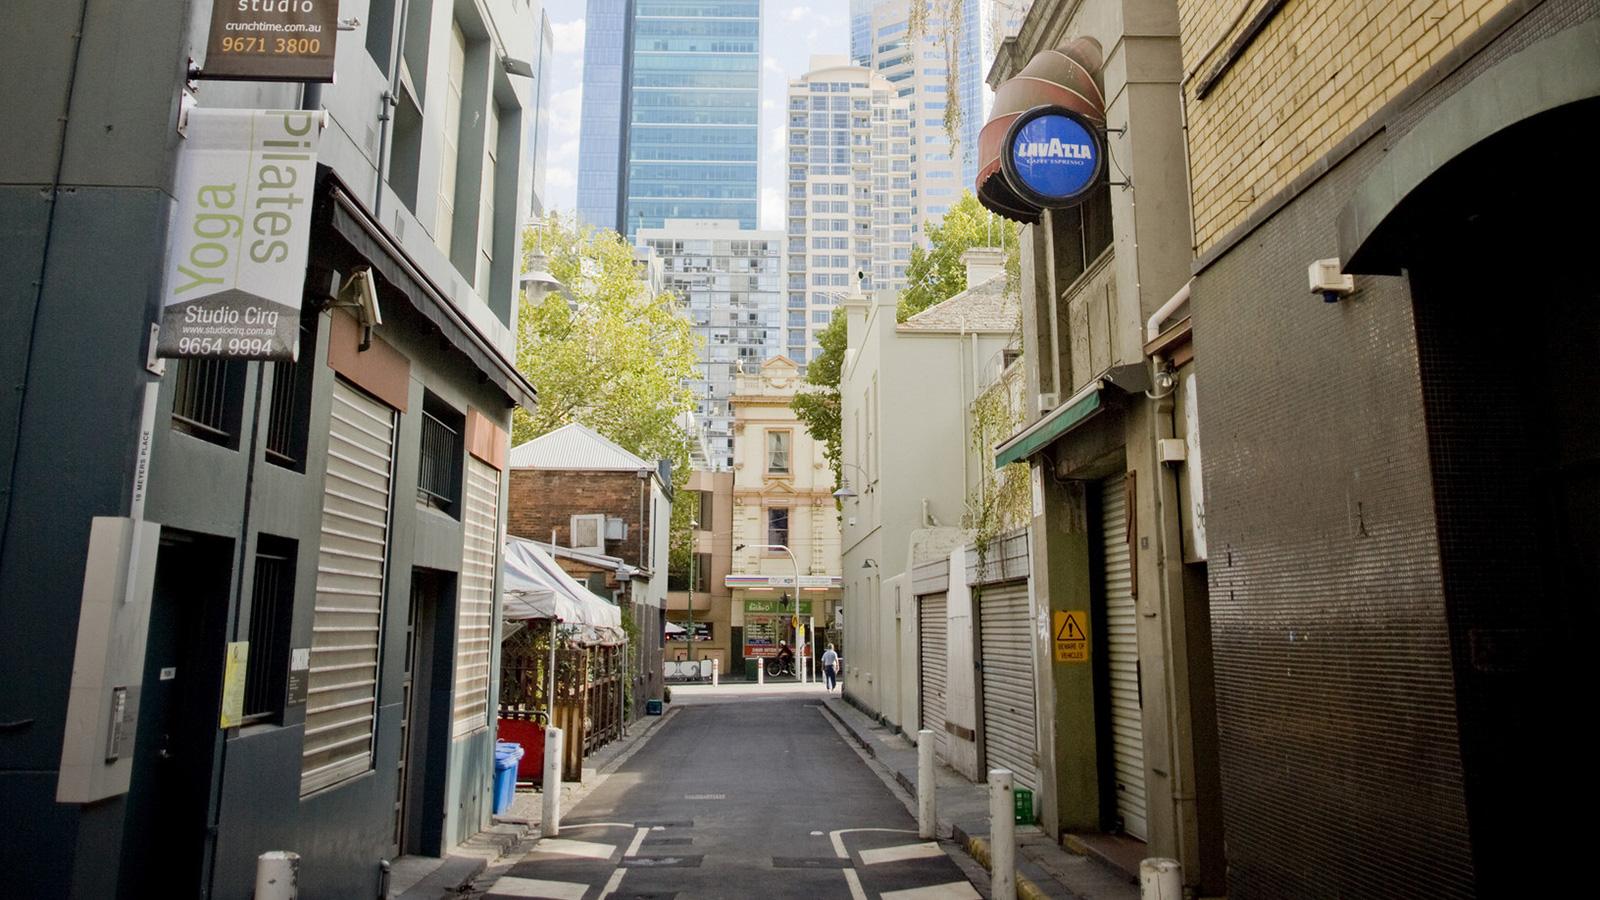 Meyers Place, Melbourne, Victoria, Australia. Photo: Mark Chew